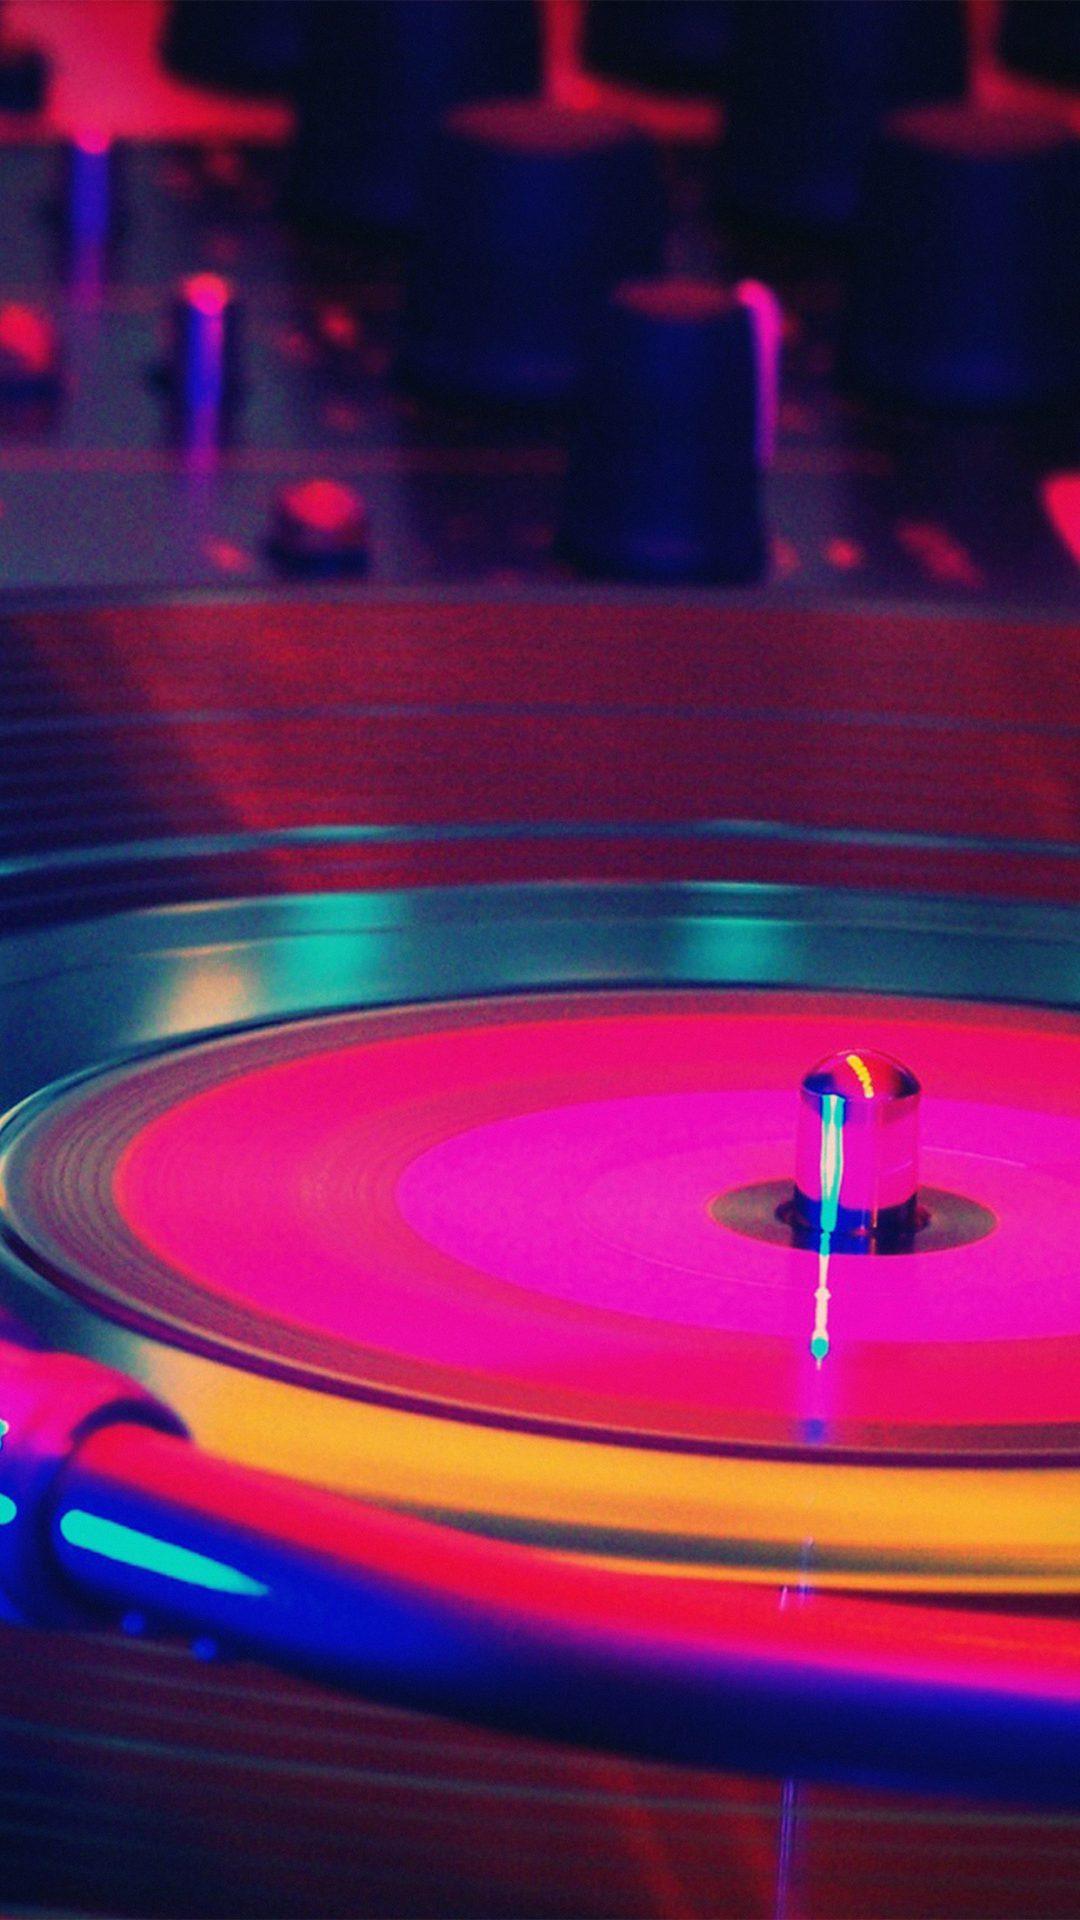 Music Dj Art Rainbow Color Red